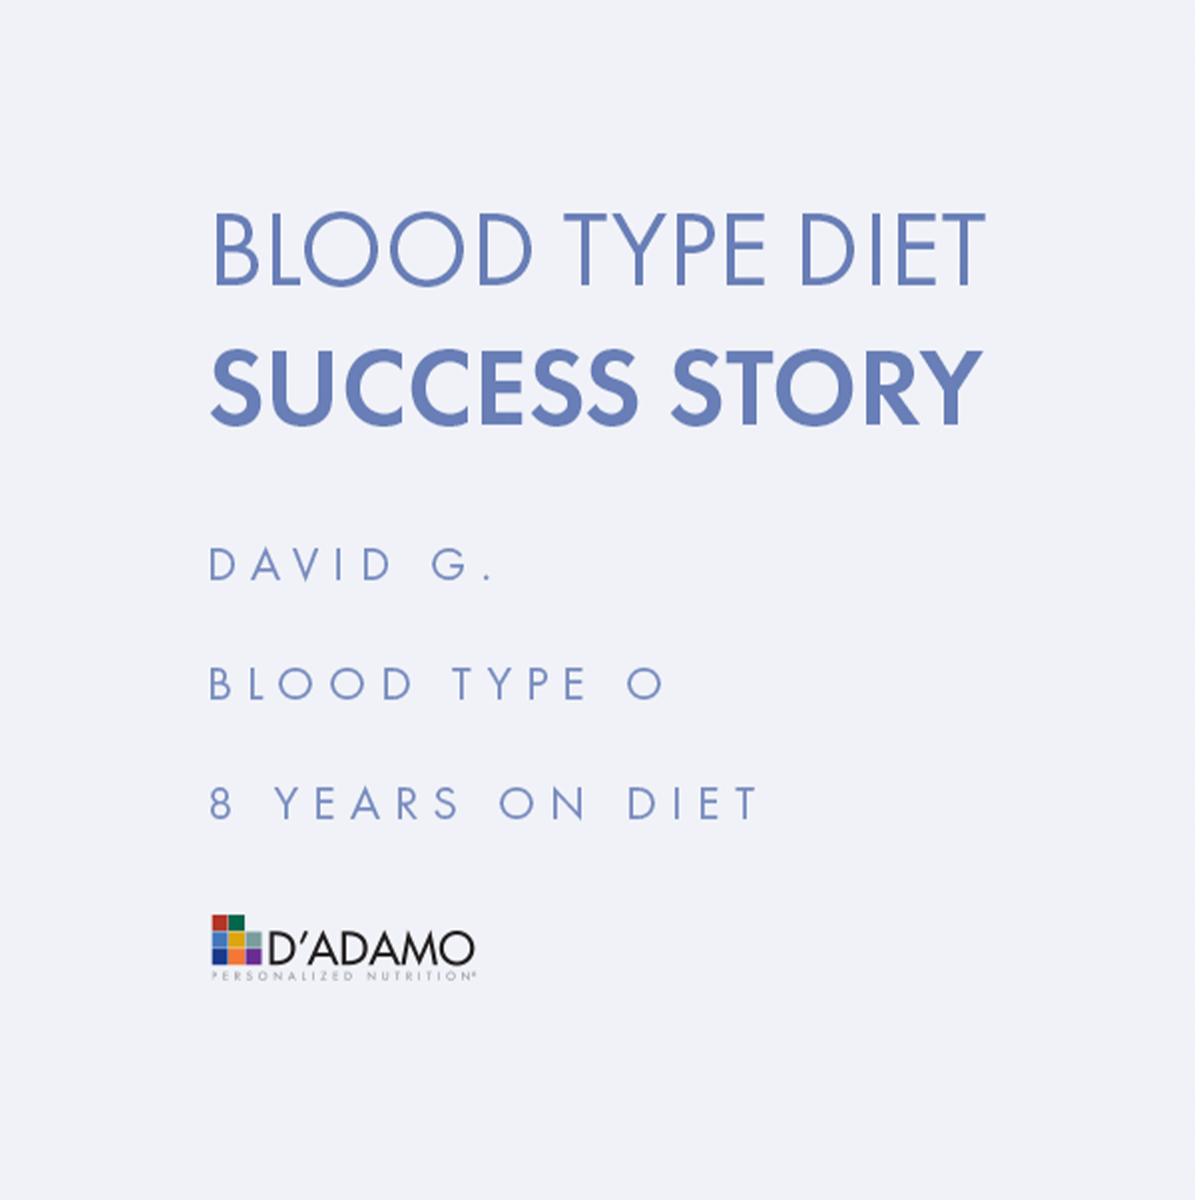 David G. - Blood Type Diet Success Story